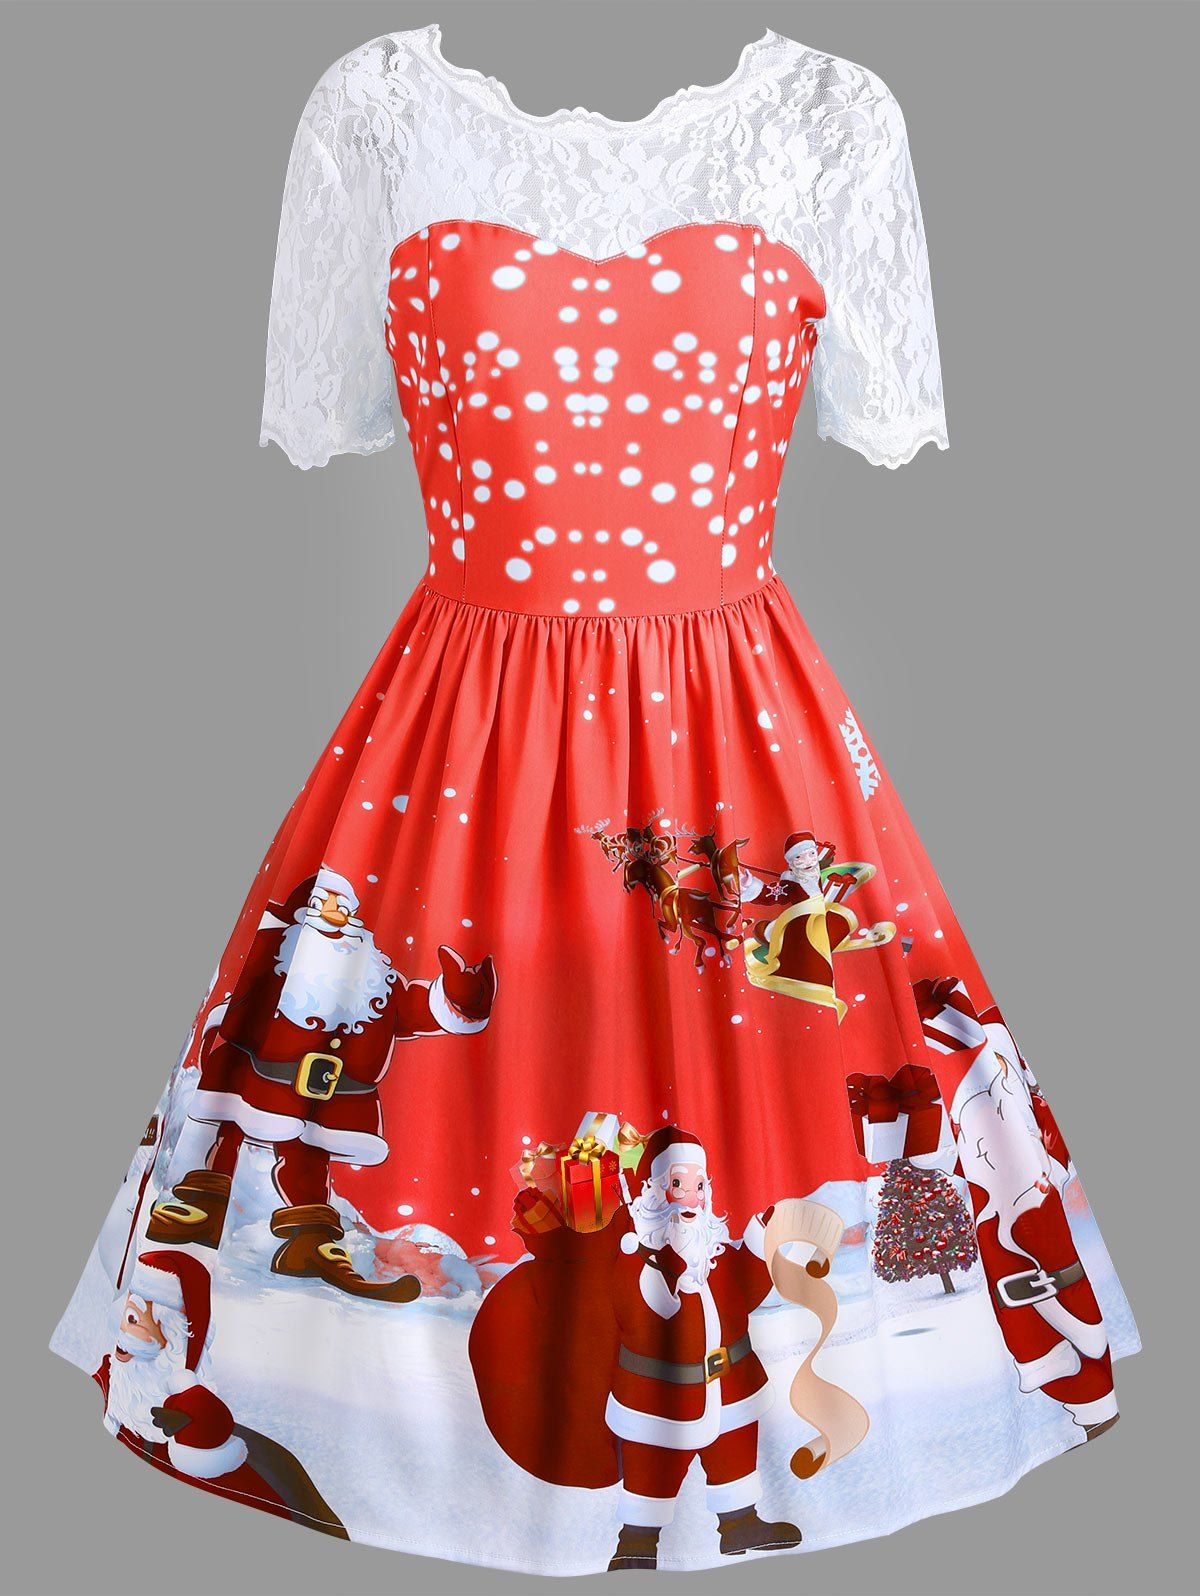 4bd006700859 Vintage Christmas Lace Insert Santa Claus Print Dress | LOL ...